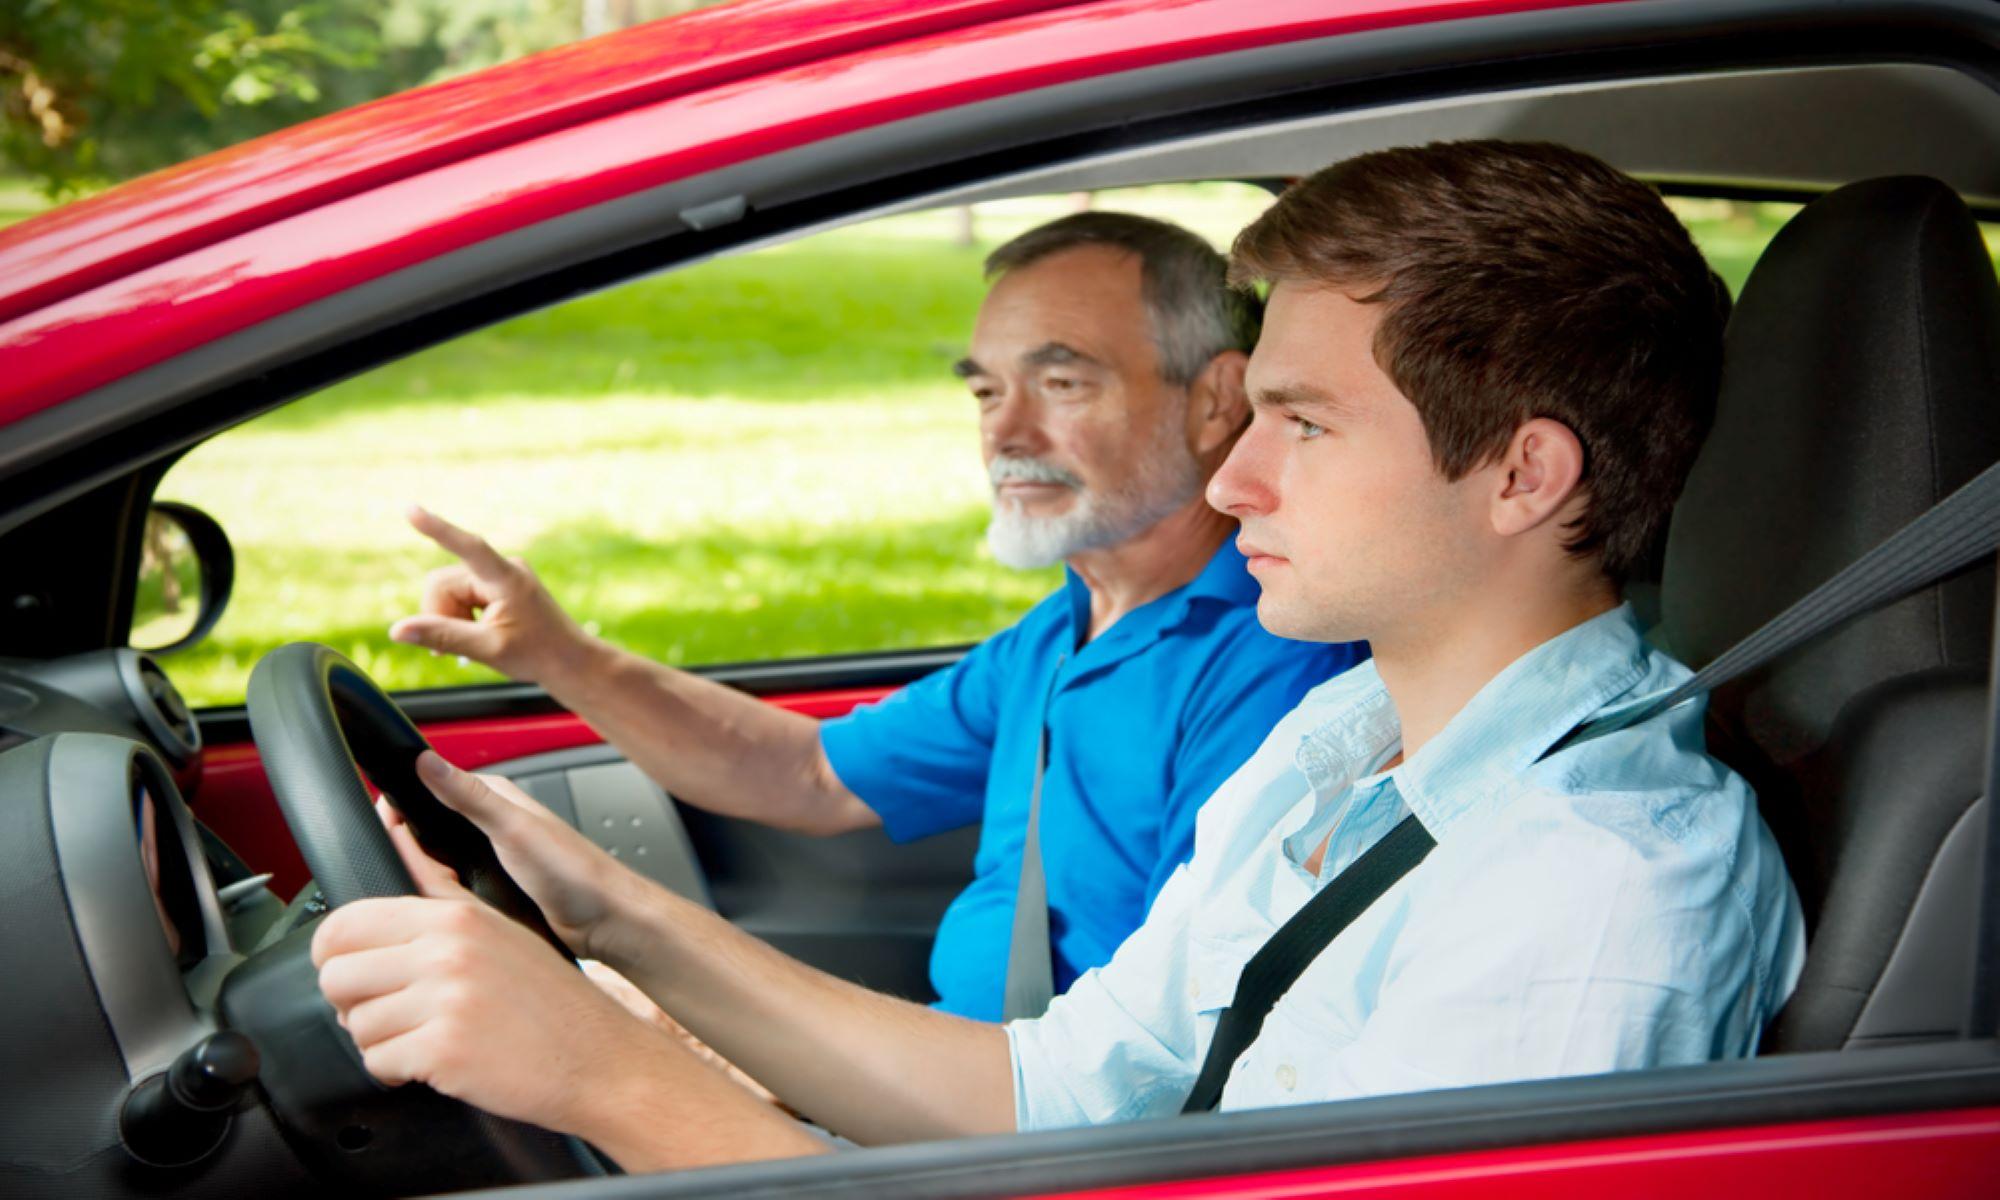 teen driver behind the wheel